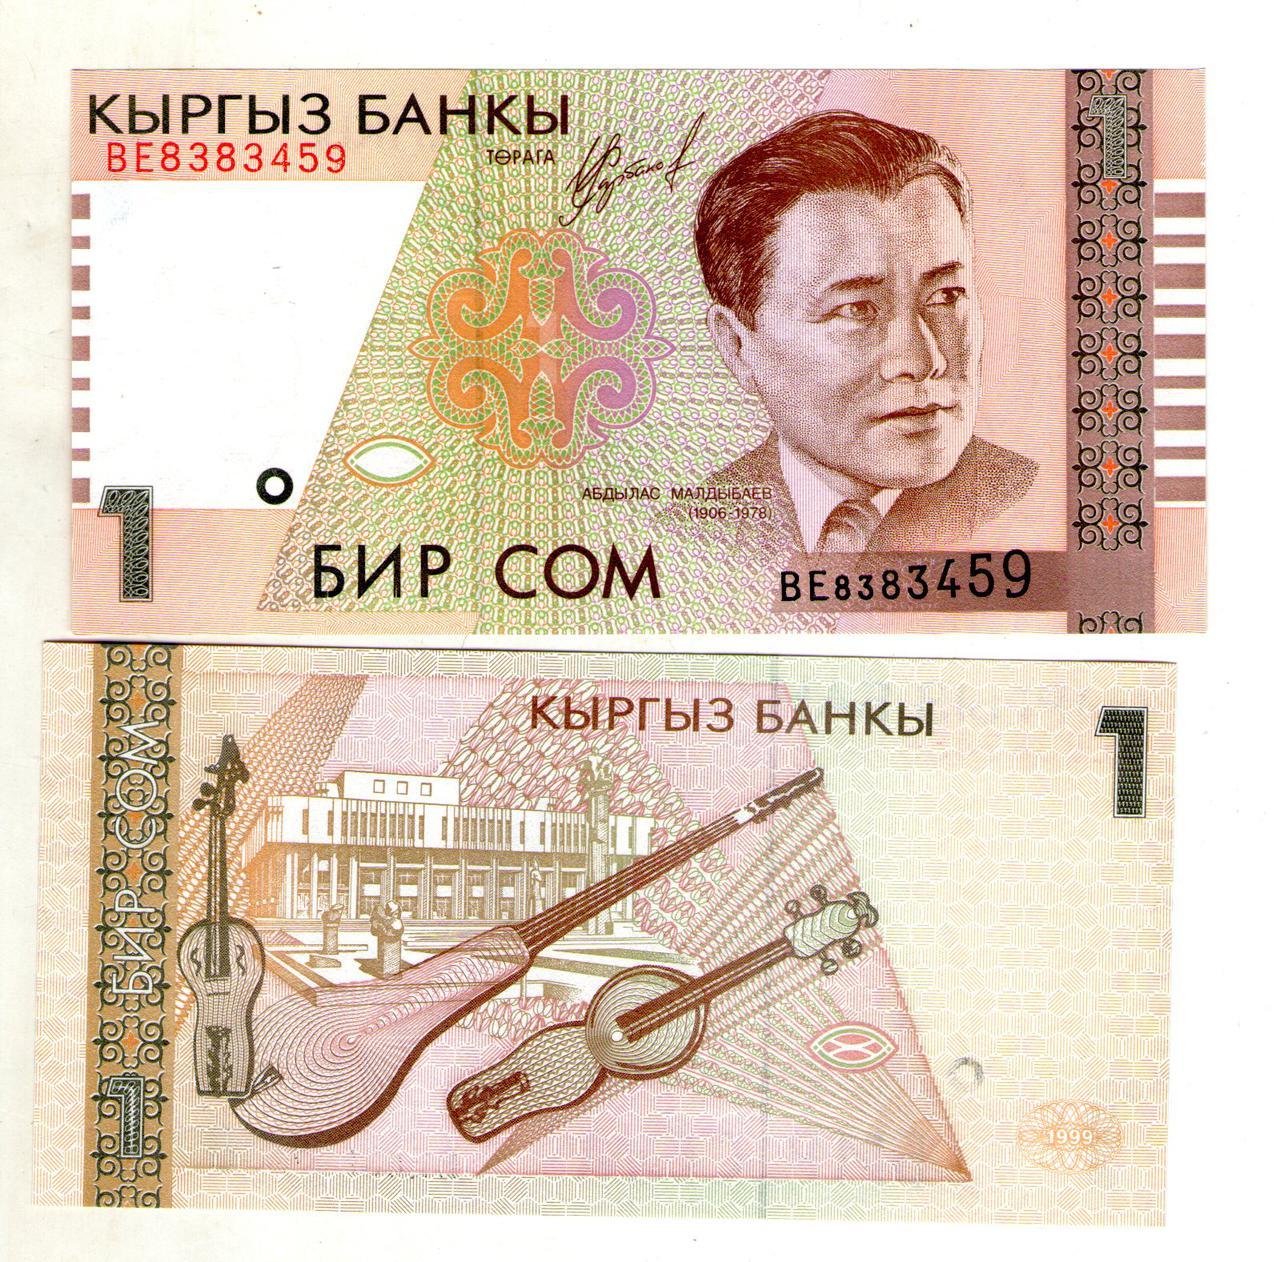 Киргизия 1 сом  1999 год состояние UNS